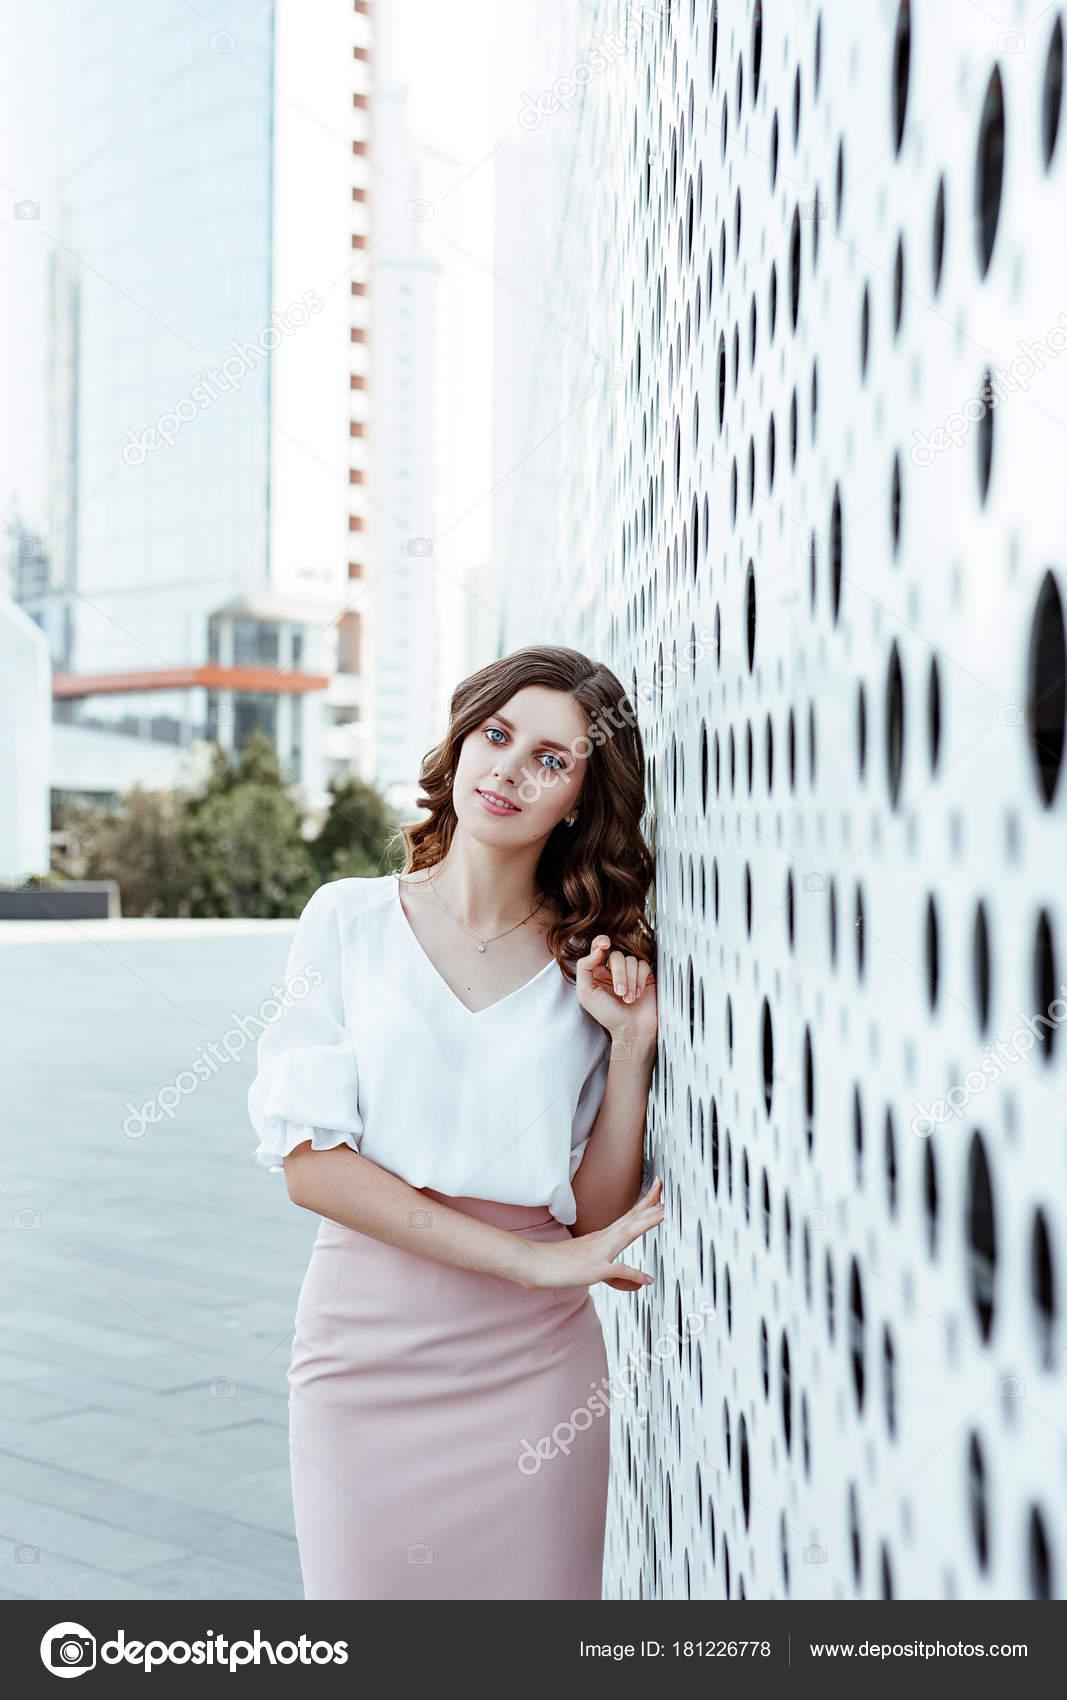 8f132f55421d Γραφείο στυλ. Ένα πορτρέτο επαγγελματίες της η νεαρή γυναίκα σε μια λευκή  μπλούζα και φούστα ροζ φόντο την πόλη αρχιτεκτονική — Εικόνα από balchugova